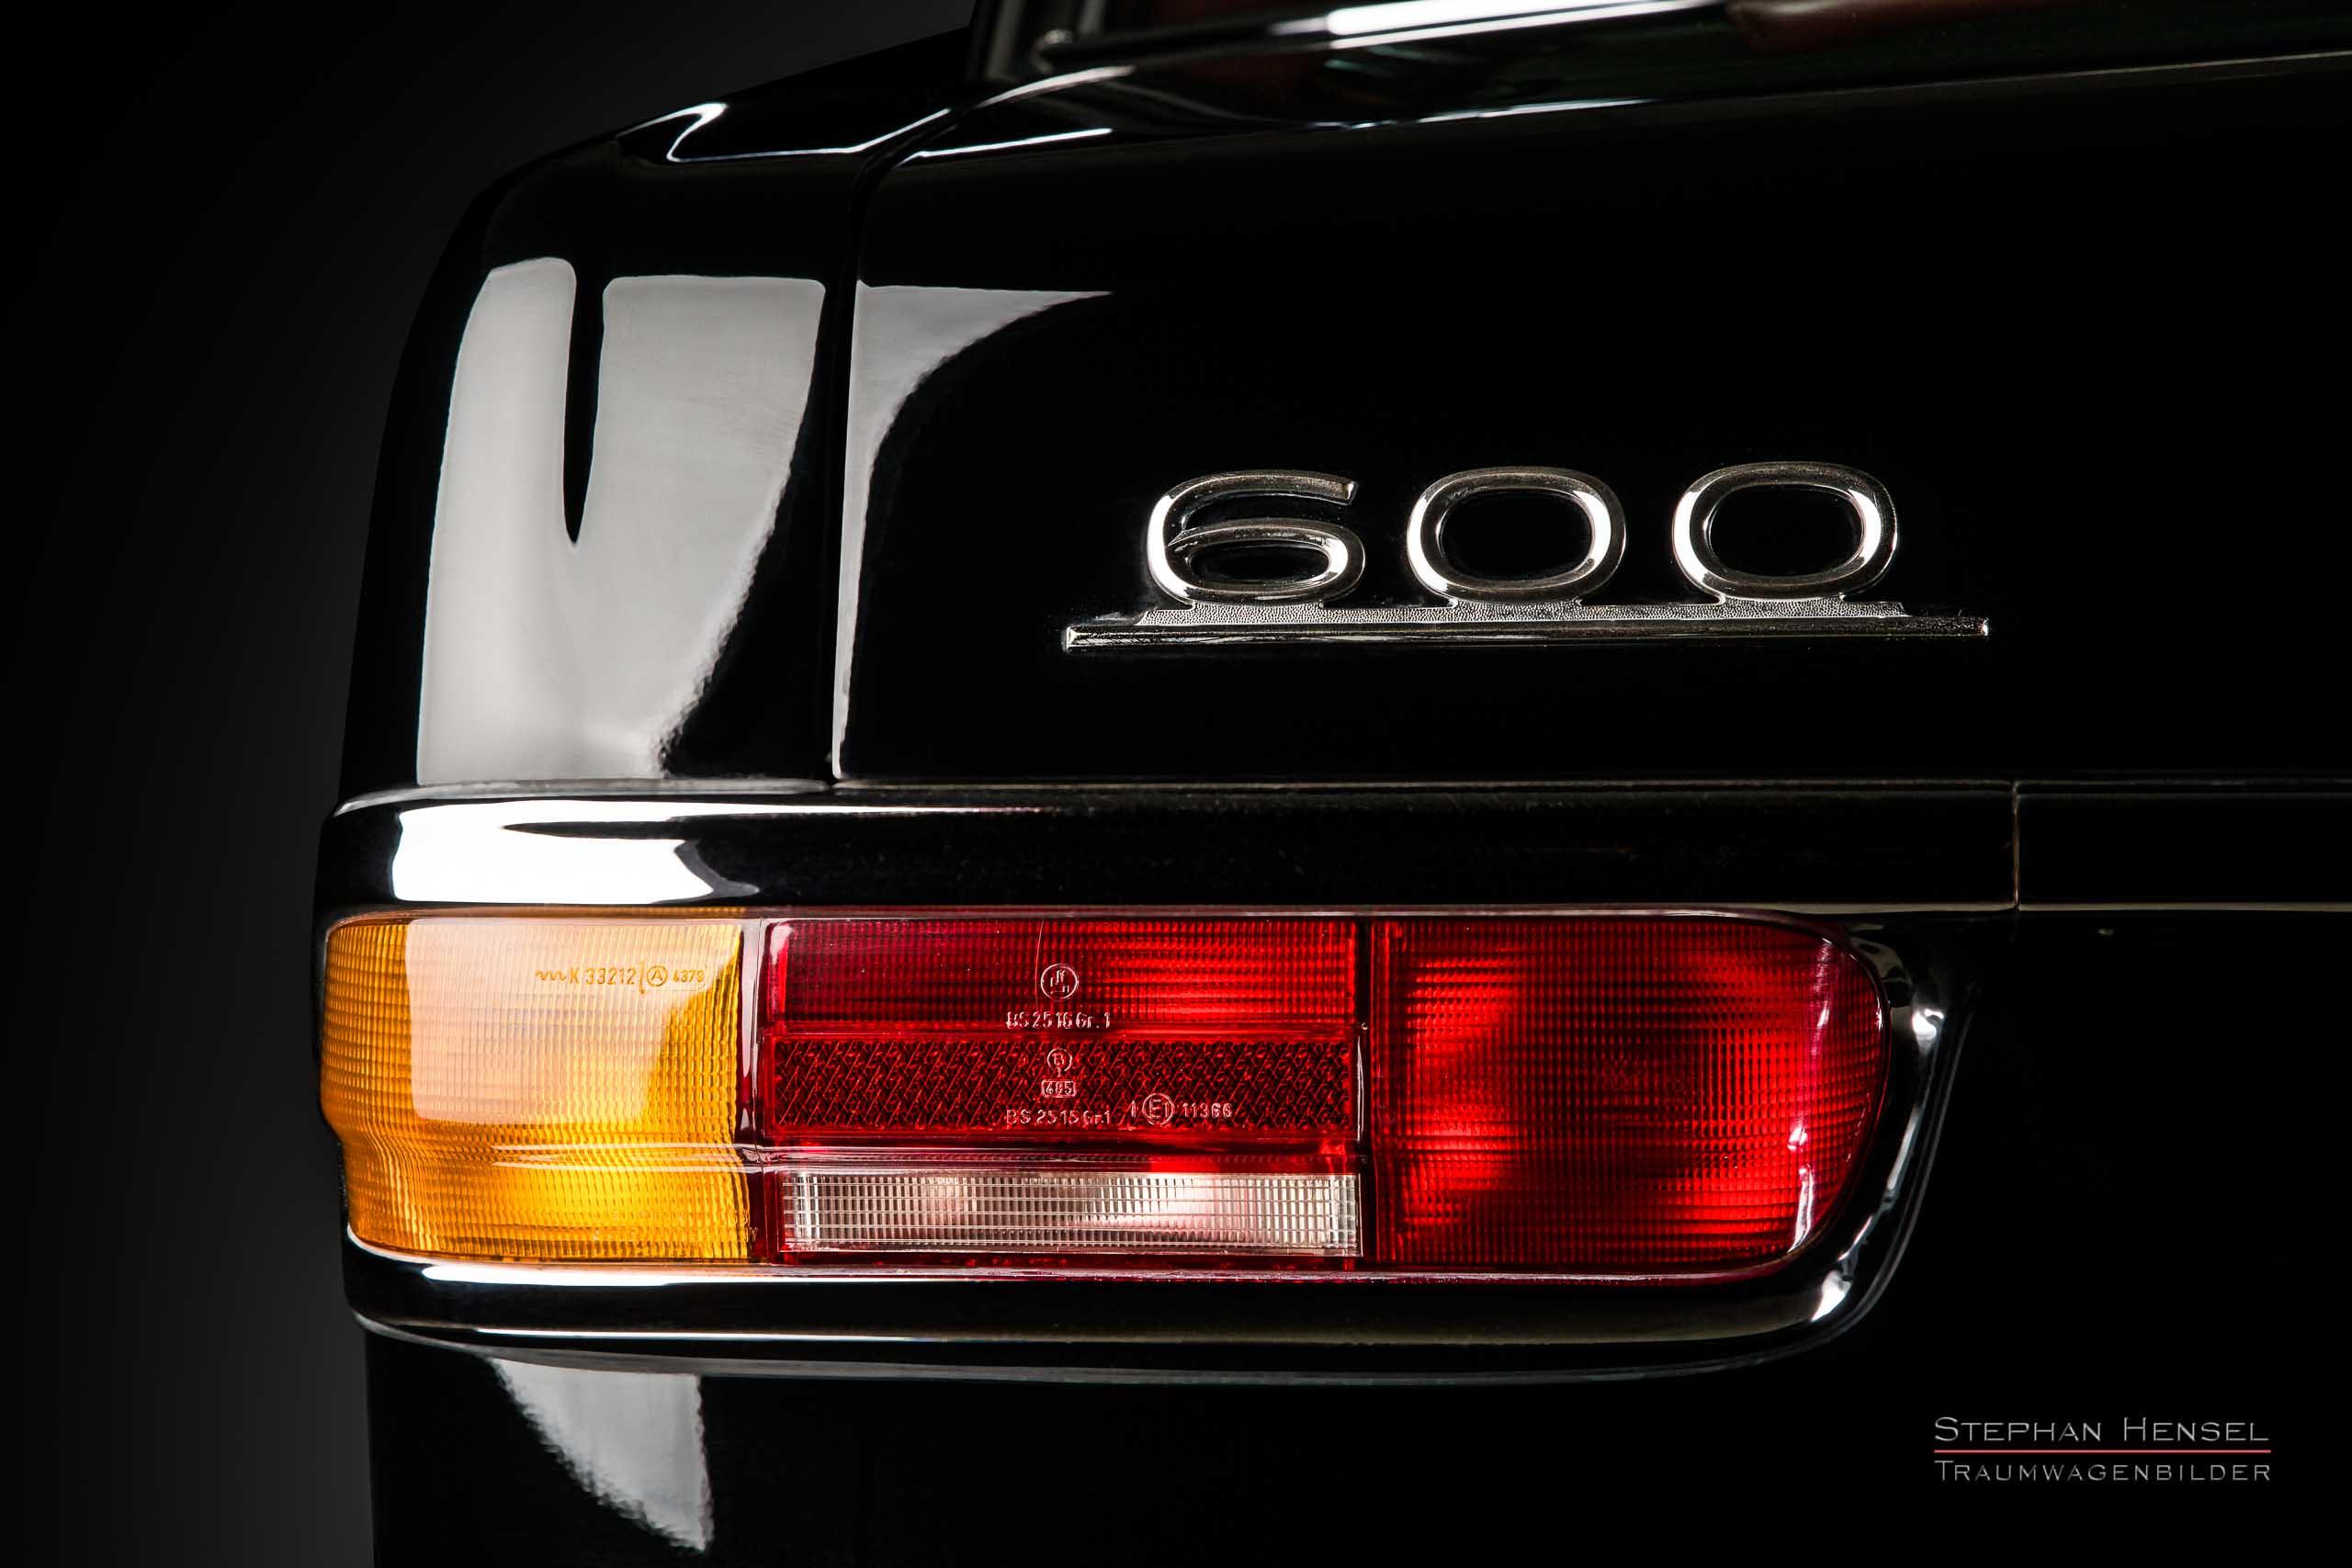 Mercedes-Benz 600, Großer Mercedes, Autofotografie: Stephan Hensel, Hamburg, Oldtimerfotograf, Autofotograf, Automobilfotograf, Oldtimerfotografie, Autofotografen